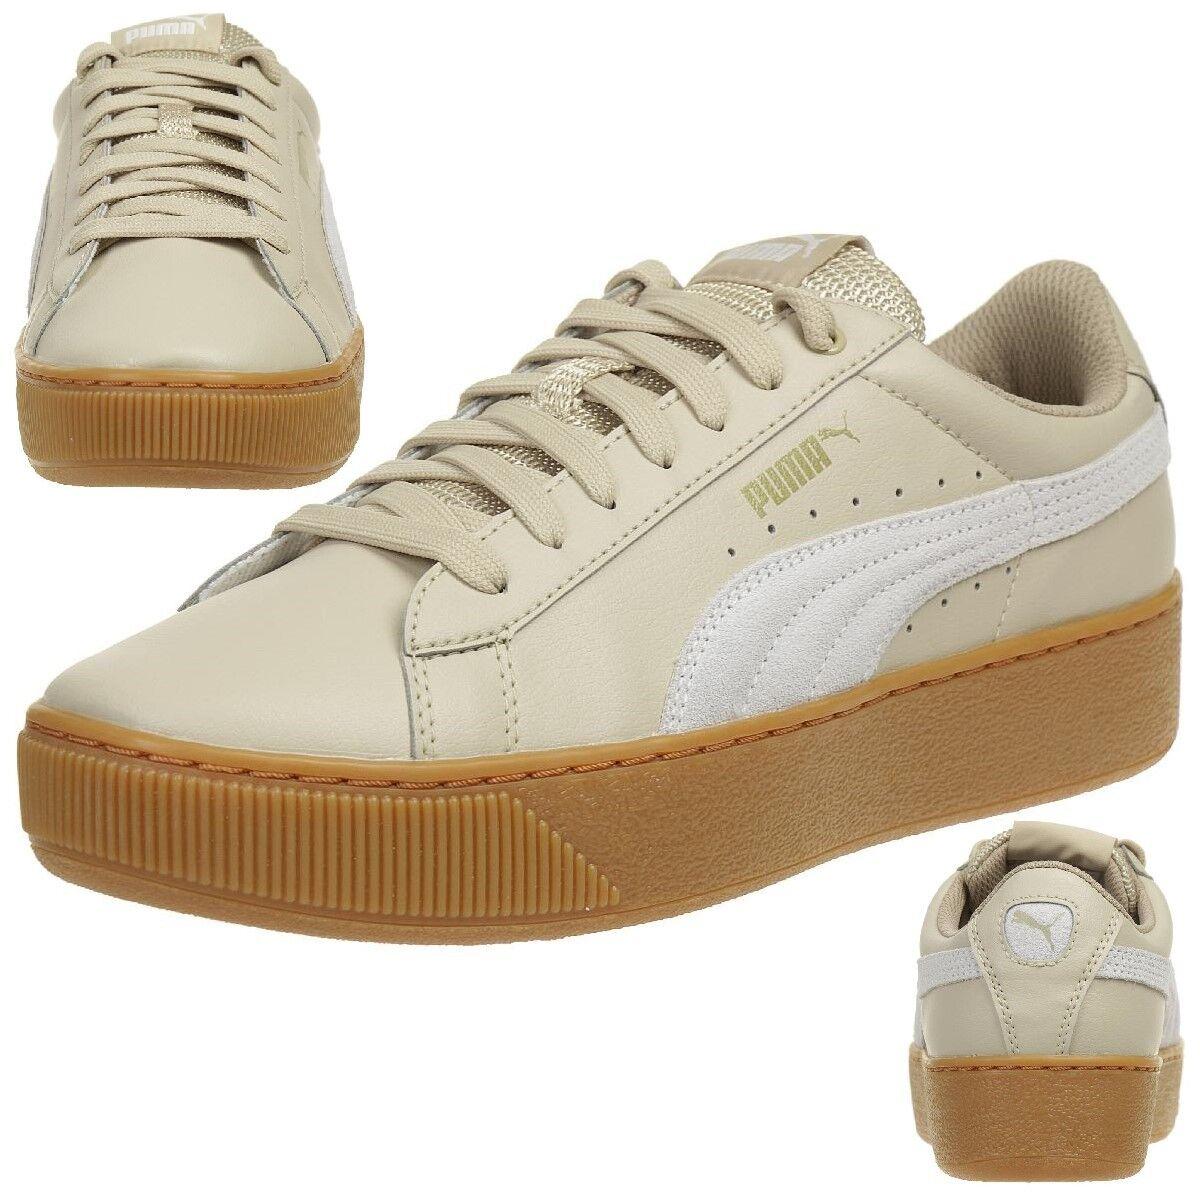 PUMA Vikky Platform L Sneaker Scarpe Donna 364893 03